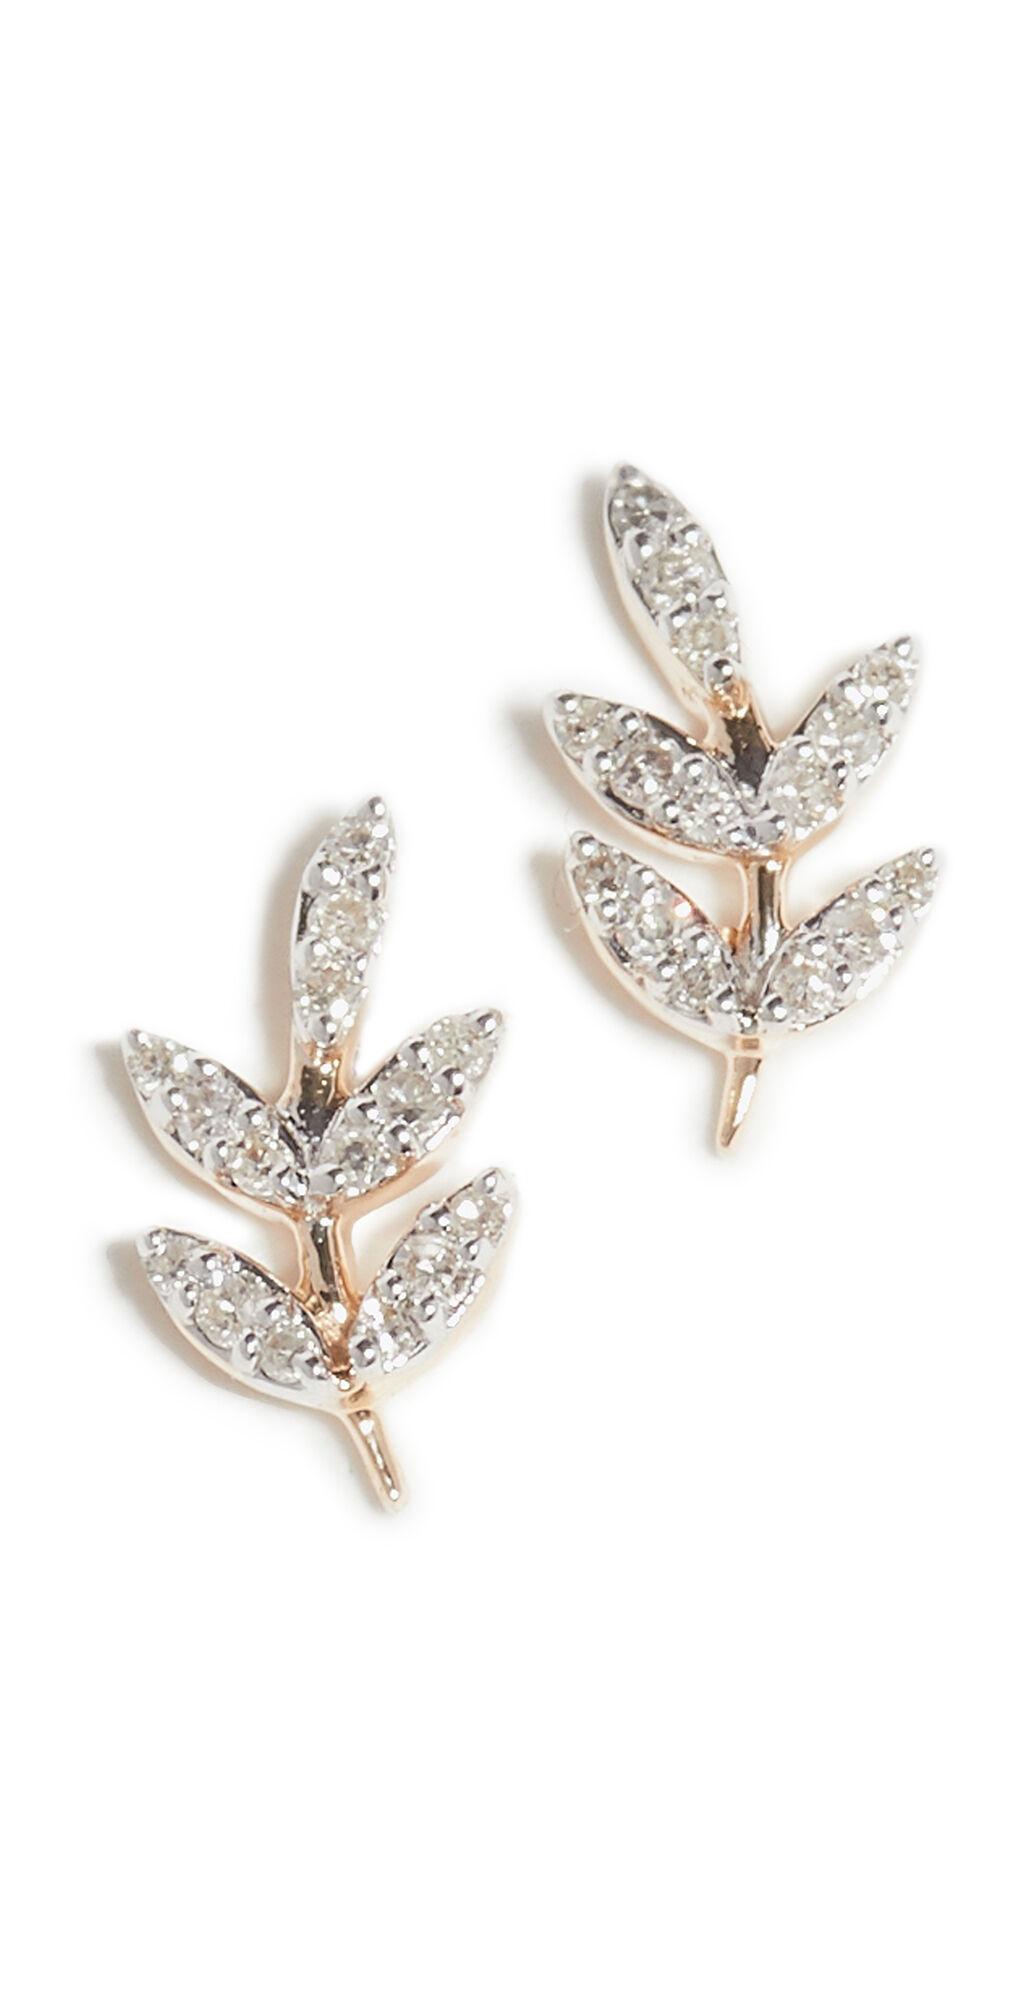 Adina Reyter 14k Garden Pavé Leaf Posts  - Yellow Gold - Size: One Size